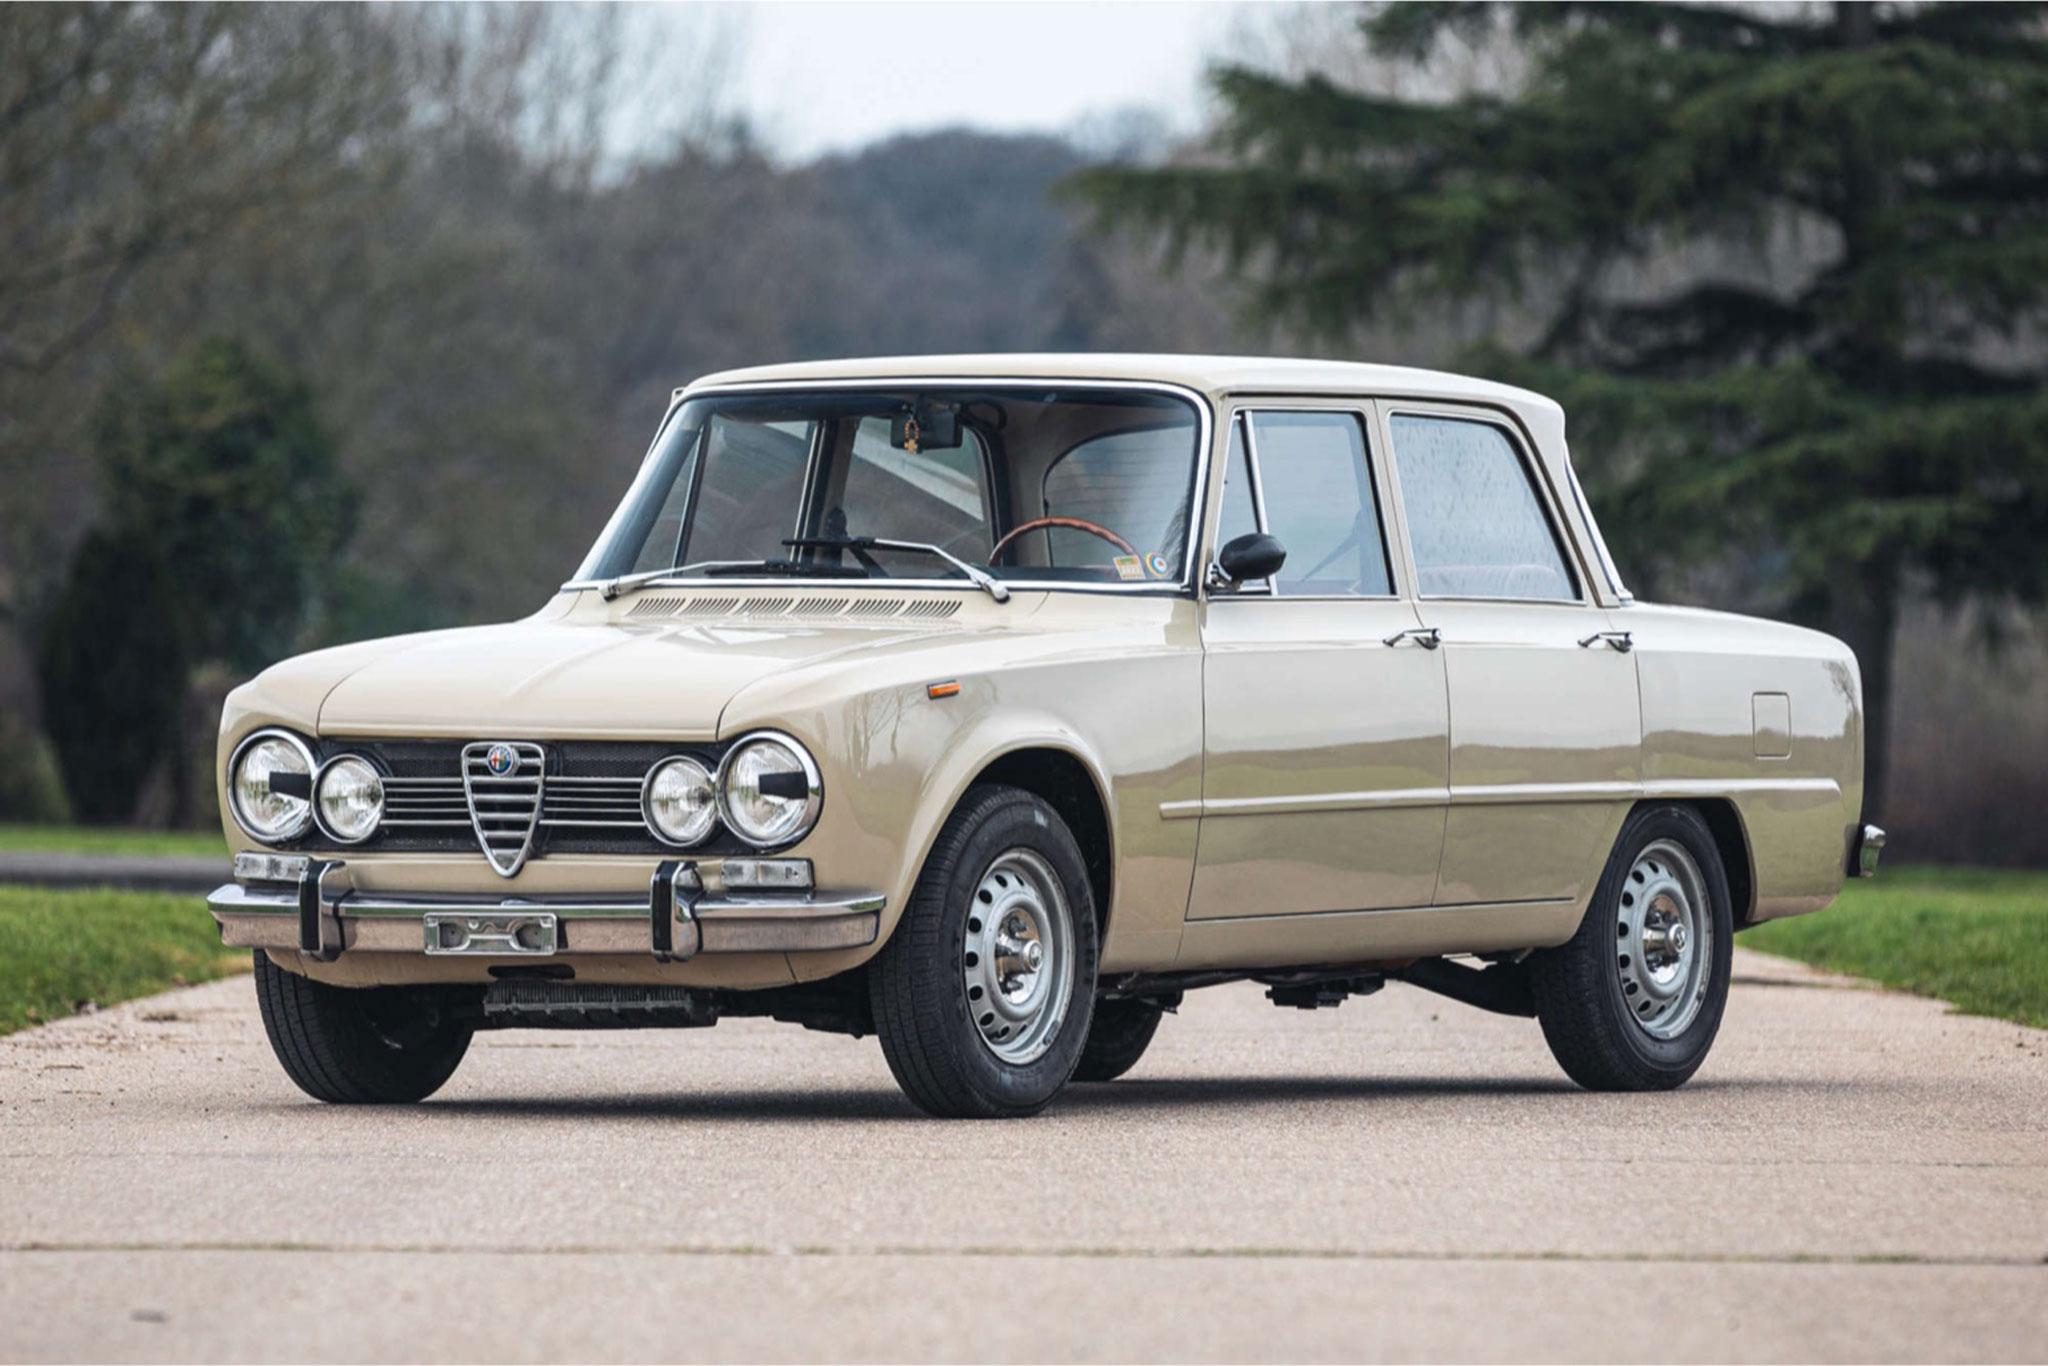 1972 Alfa Romeo Giulia Super 1.3 vue trois quarts avant gauche - Silverstone Auctions Mars 2021.